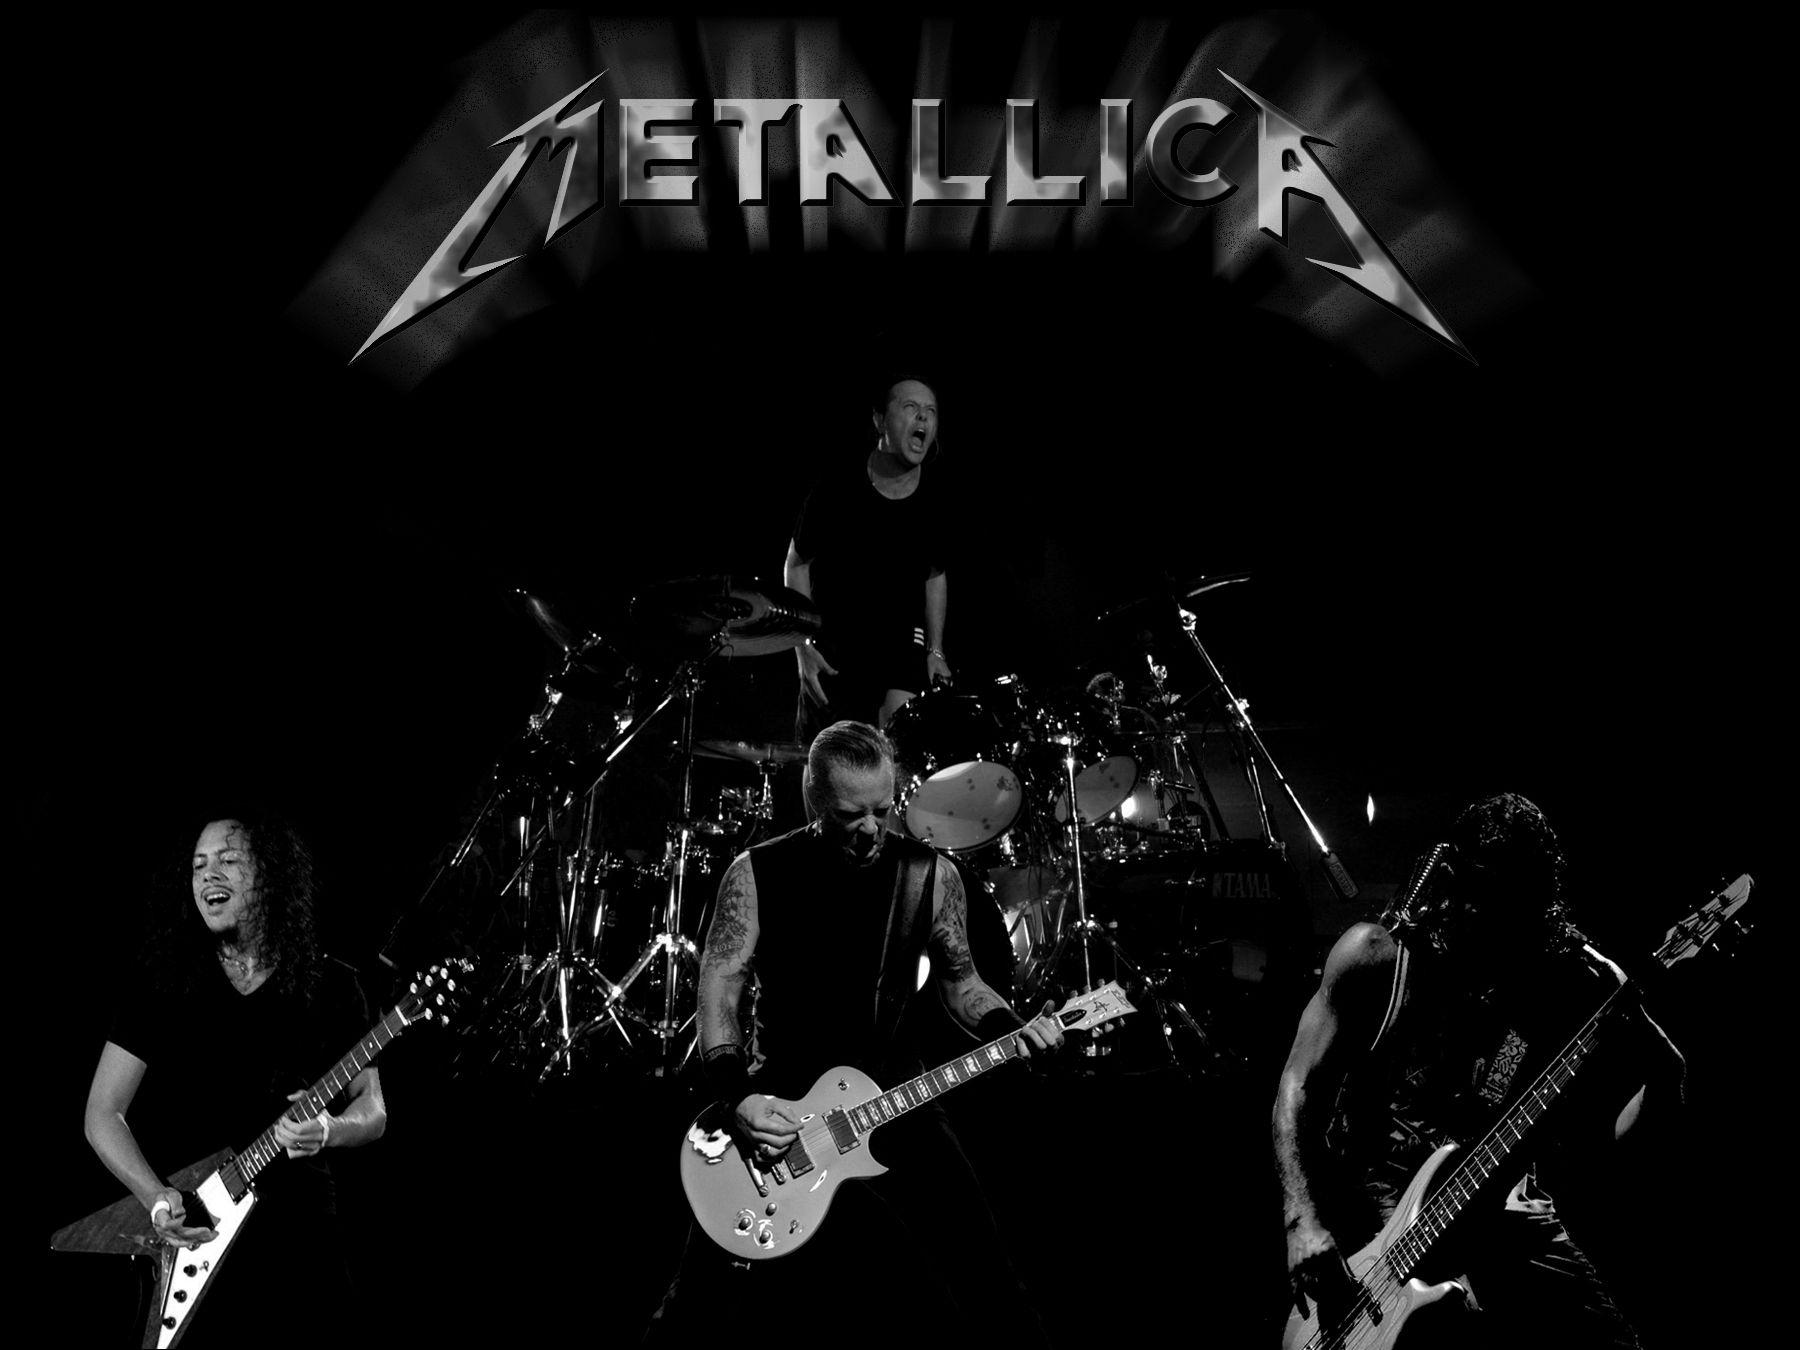 Metallica Imagines Metallica Metallica Black Album Metallica Band